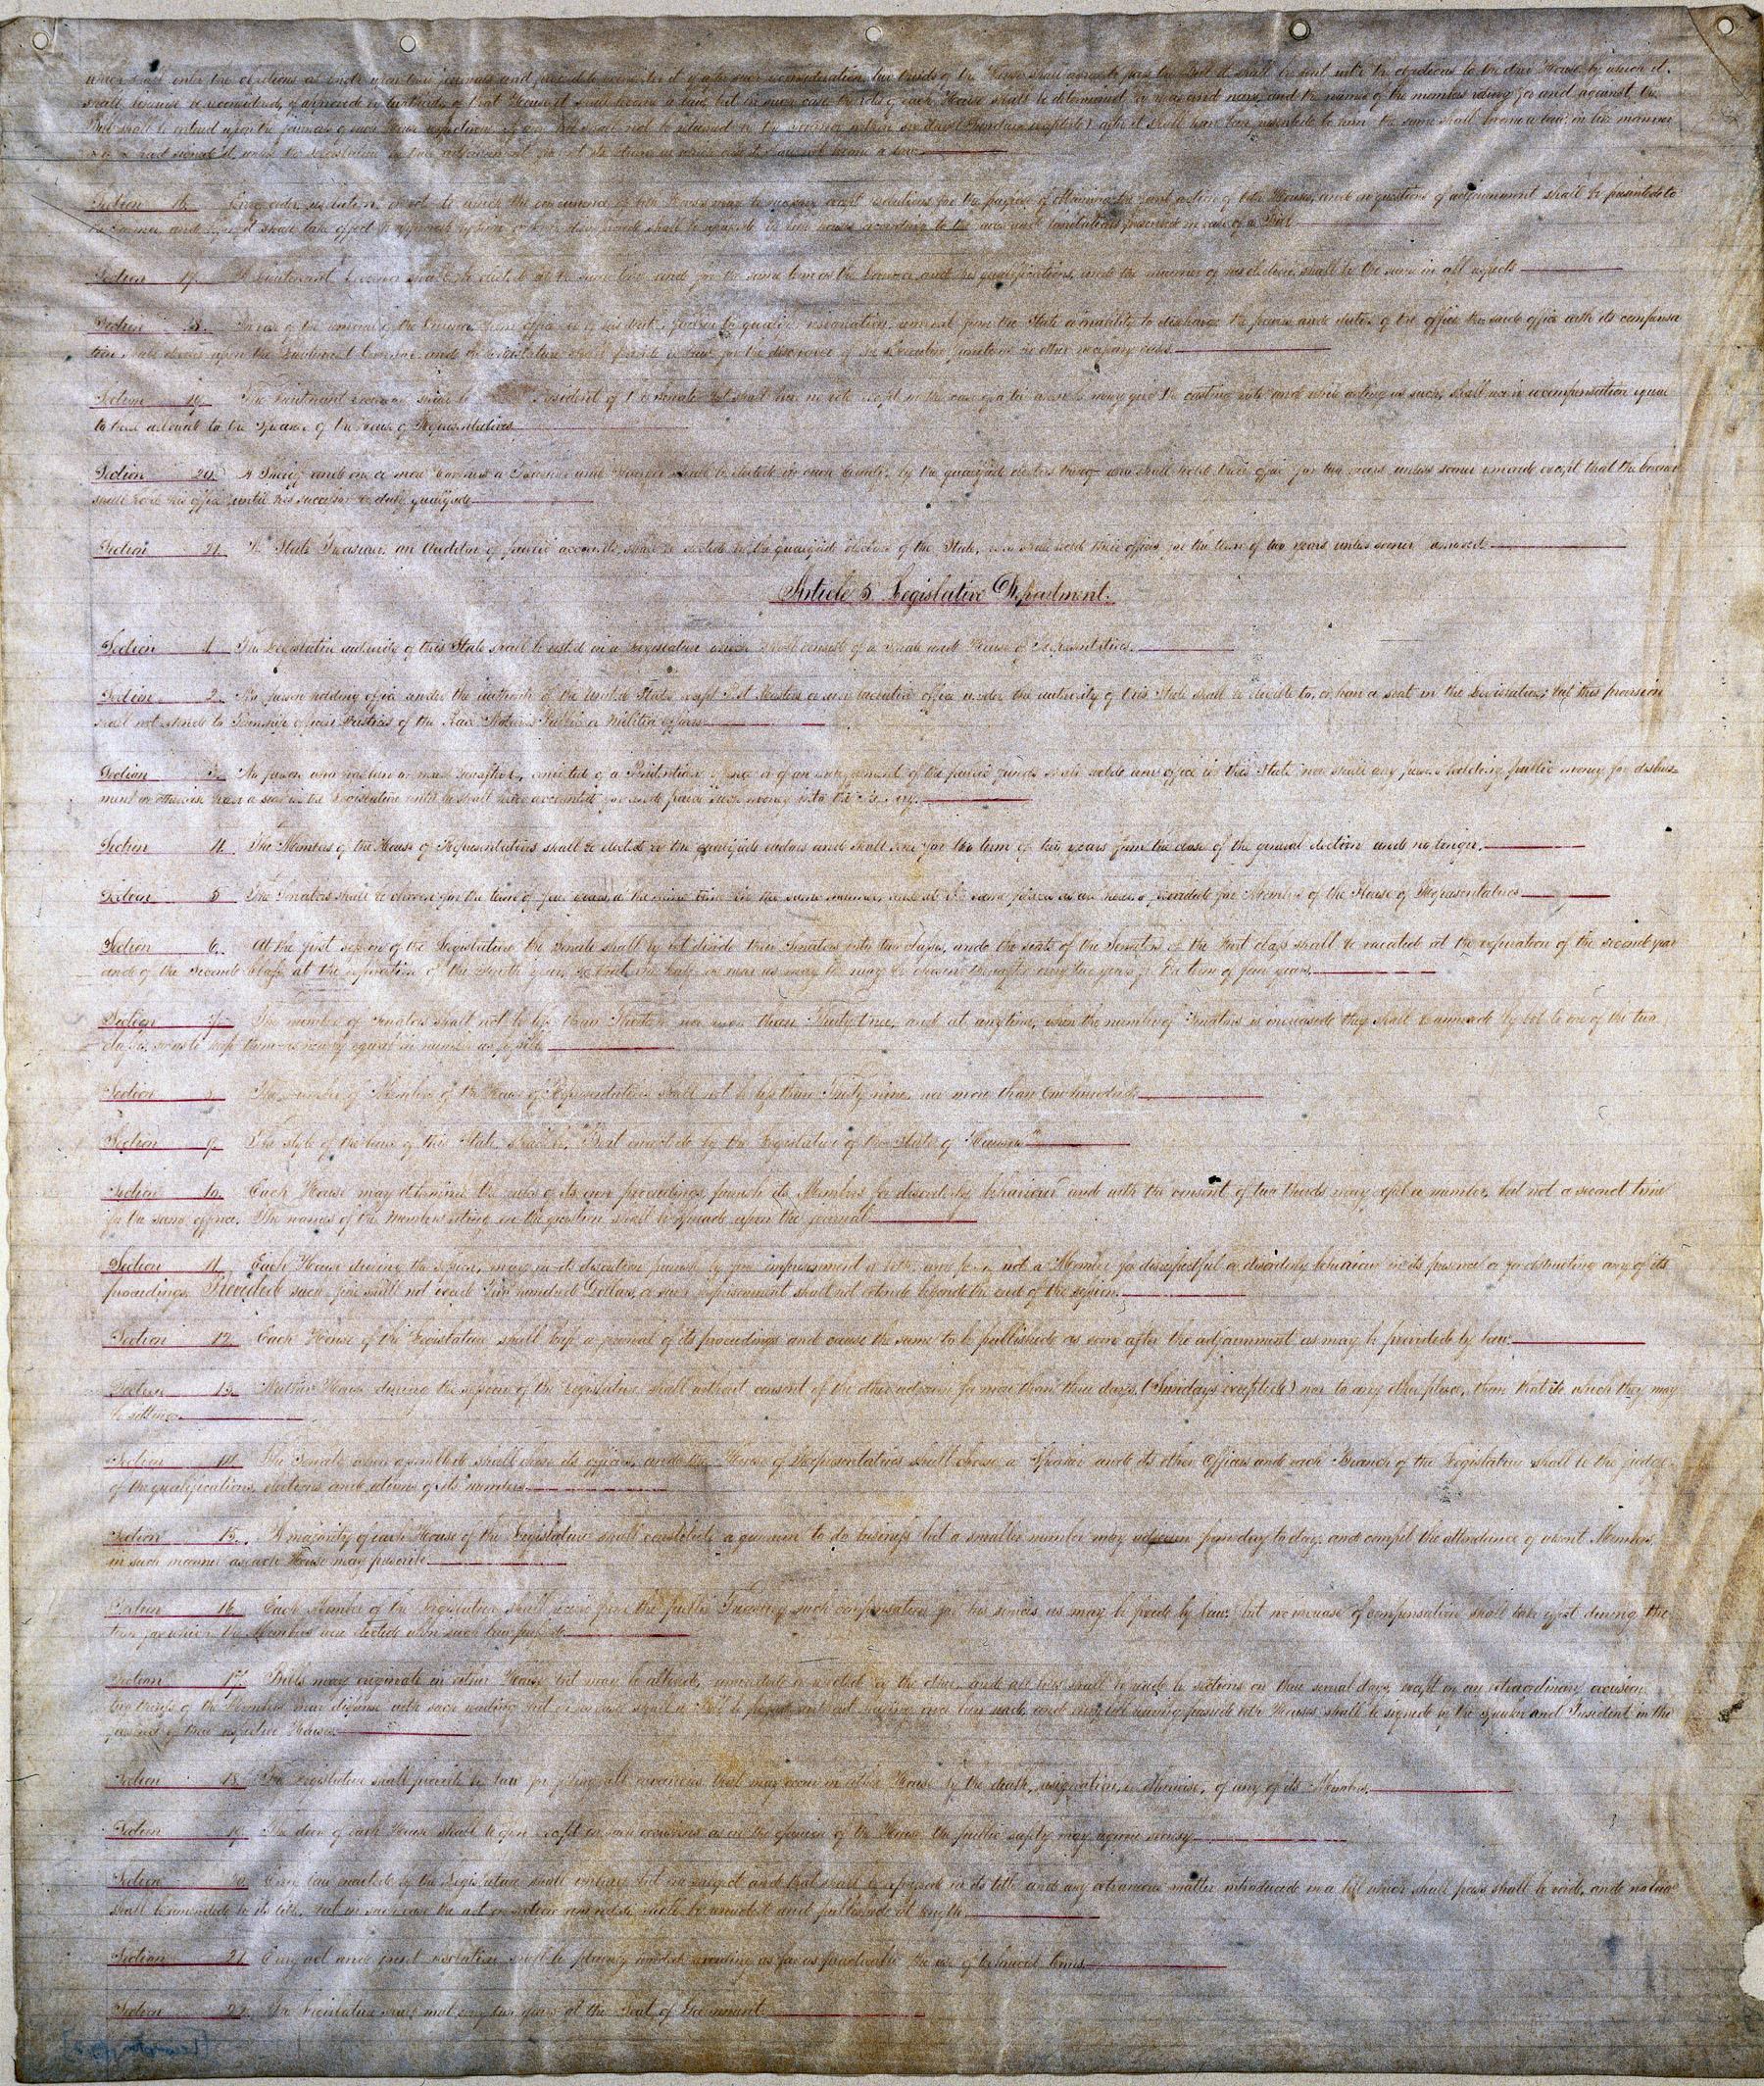 Lecompton Constitution - 2